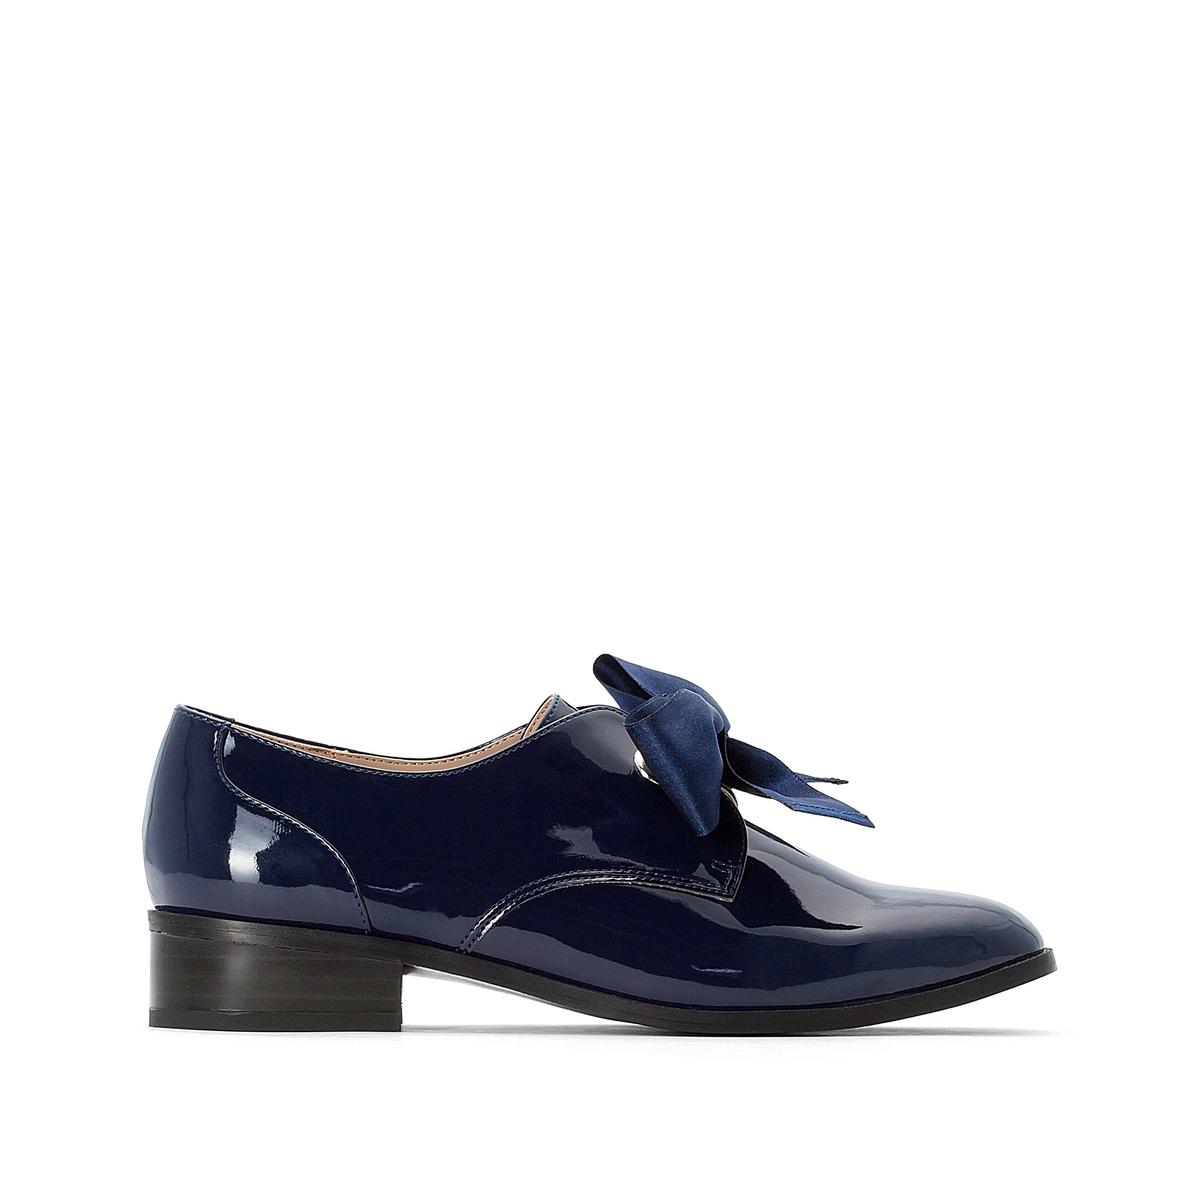 Ботинки-дерби La Redoute На шнуровке из лент 38 синий ботинки la redoute на шнуровке 38 белый